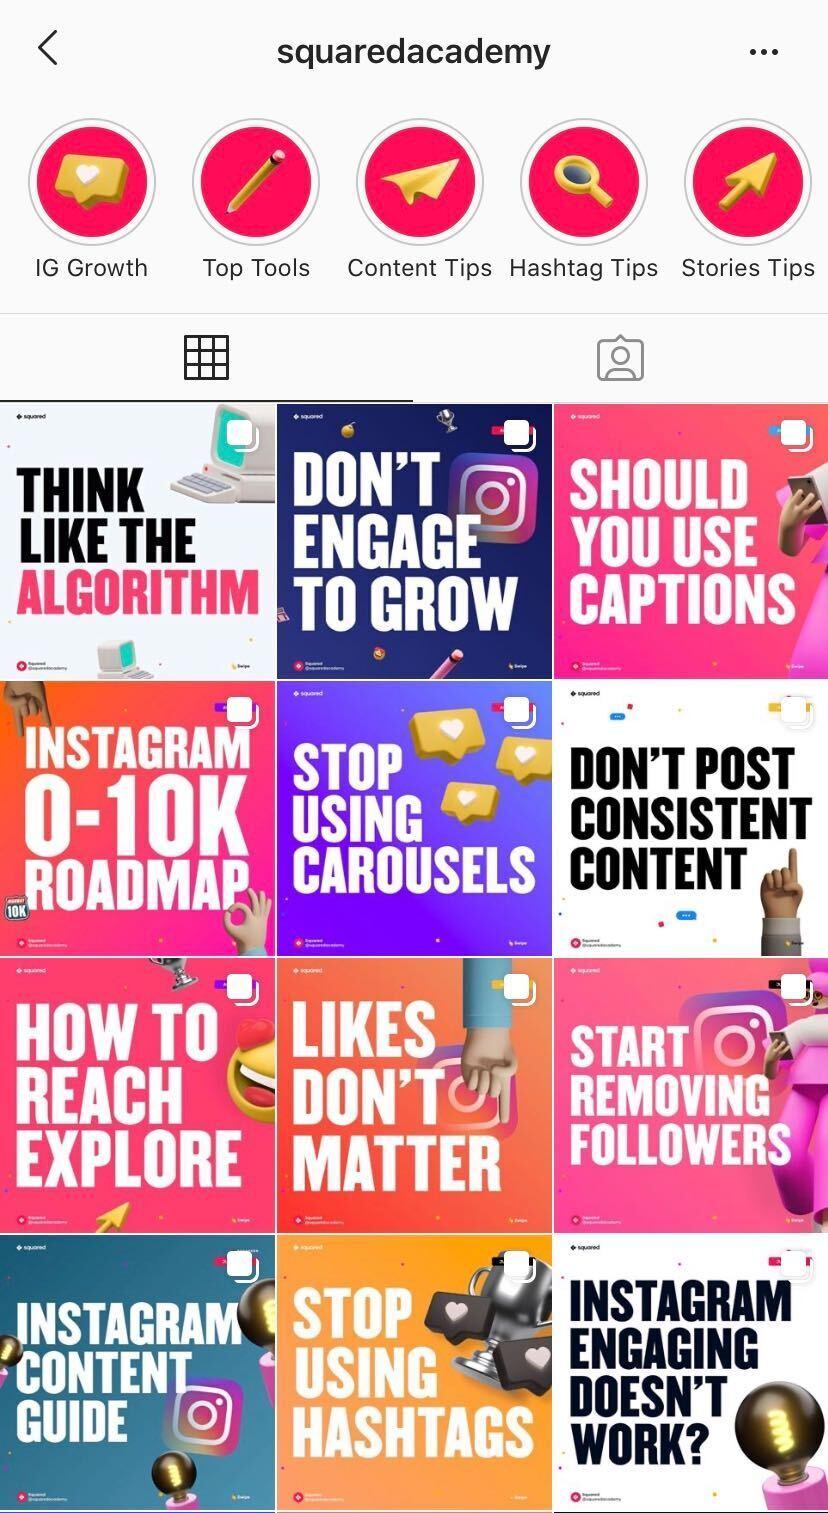 squareacademy instagram tips